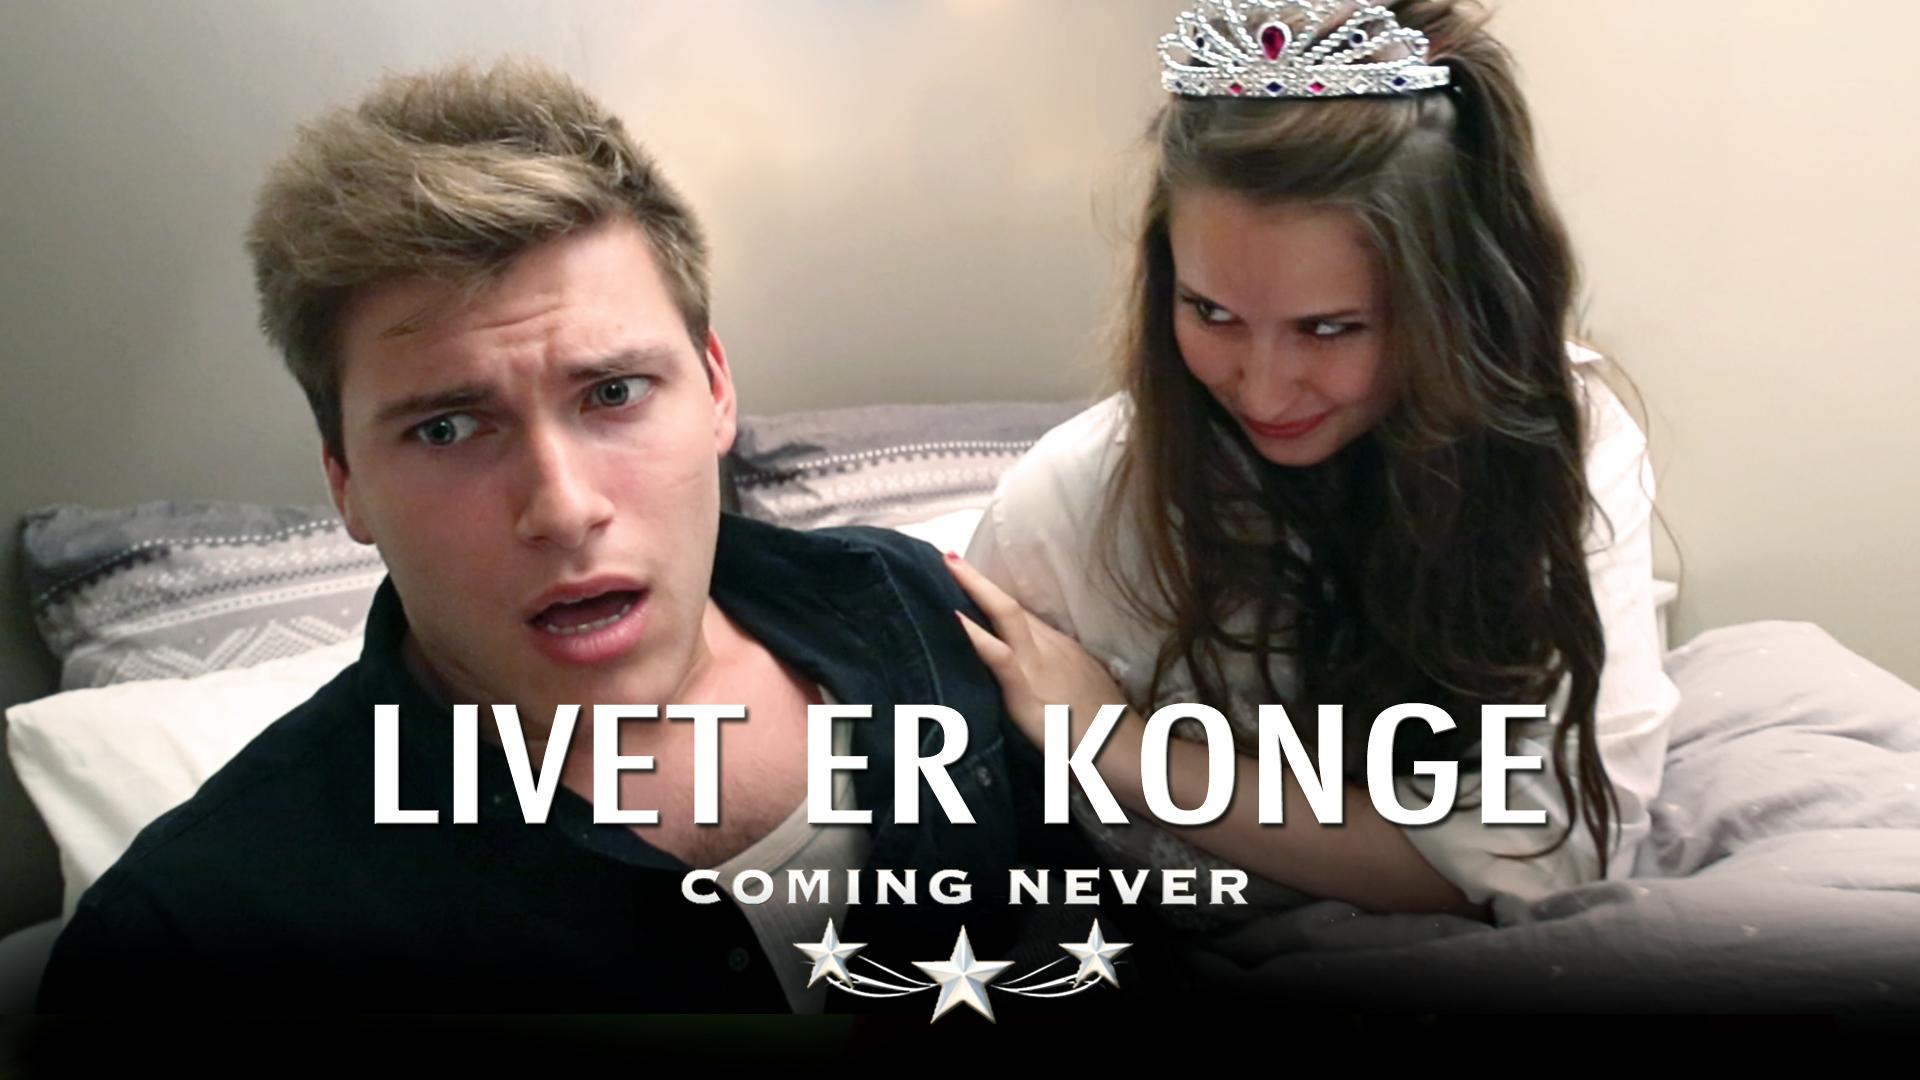 Coming never: Livet er konge